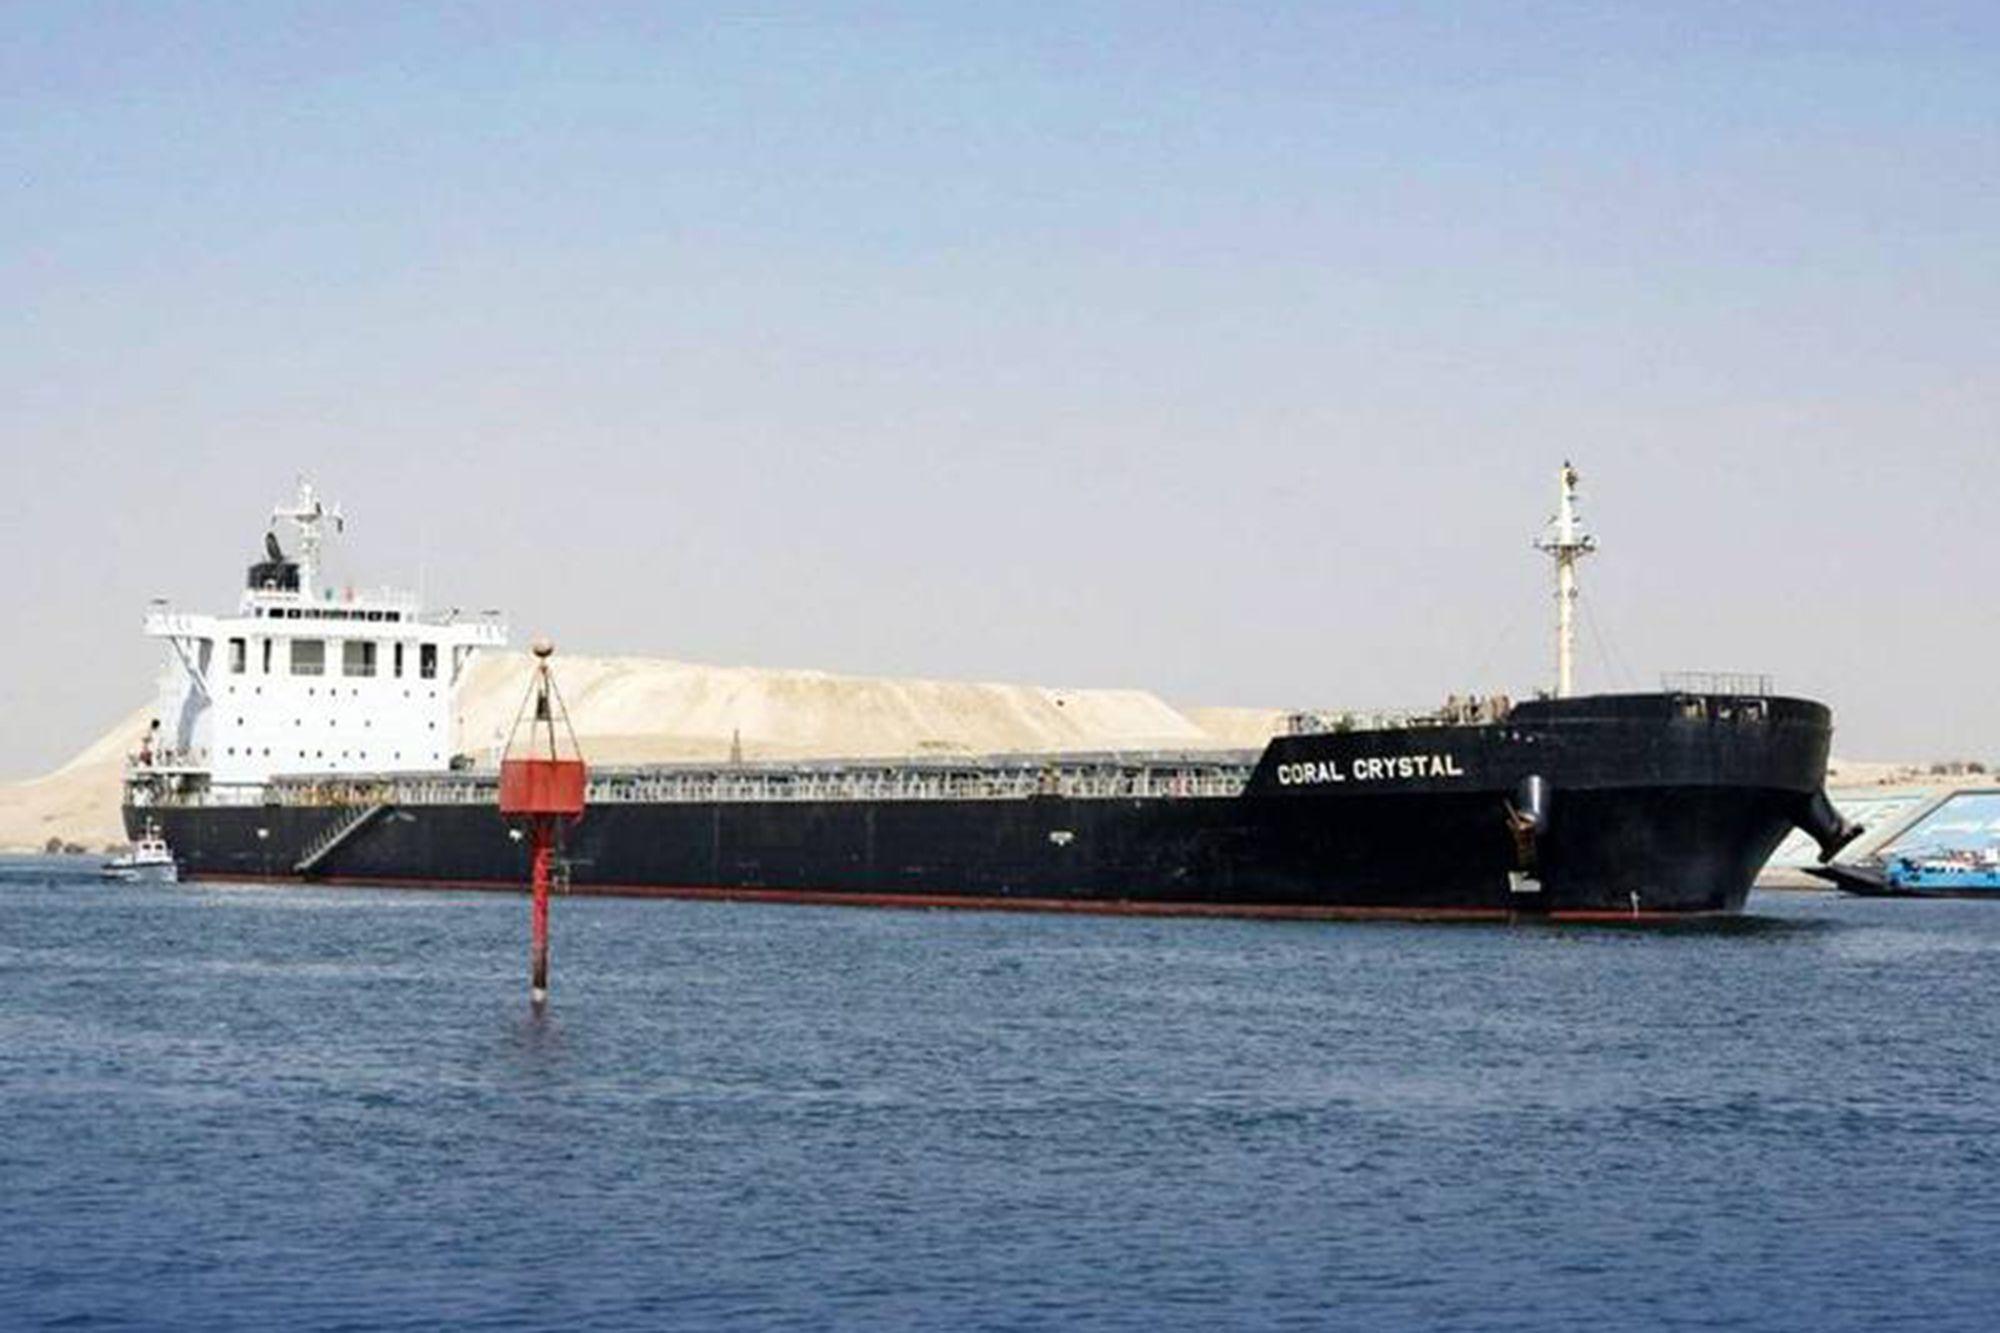 Déjà Vu: Cargo Vessel Briefly Blocks Suez Canal Lane